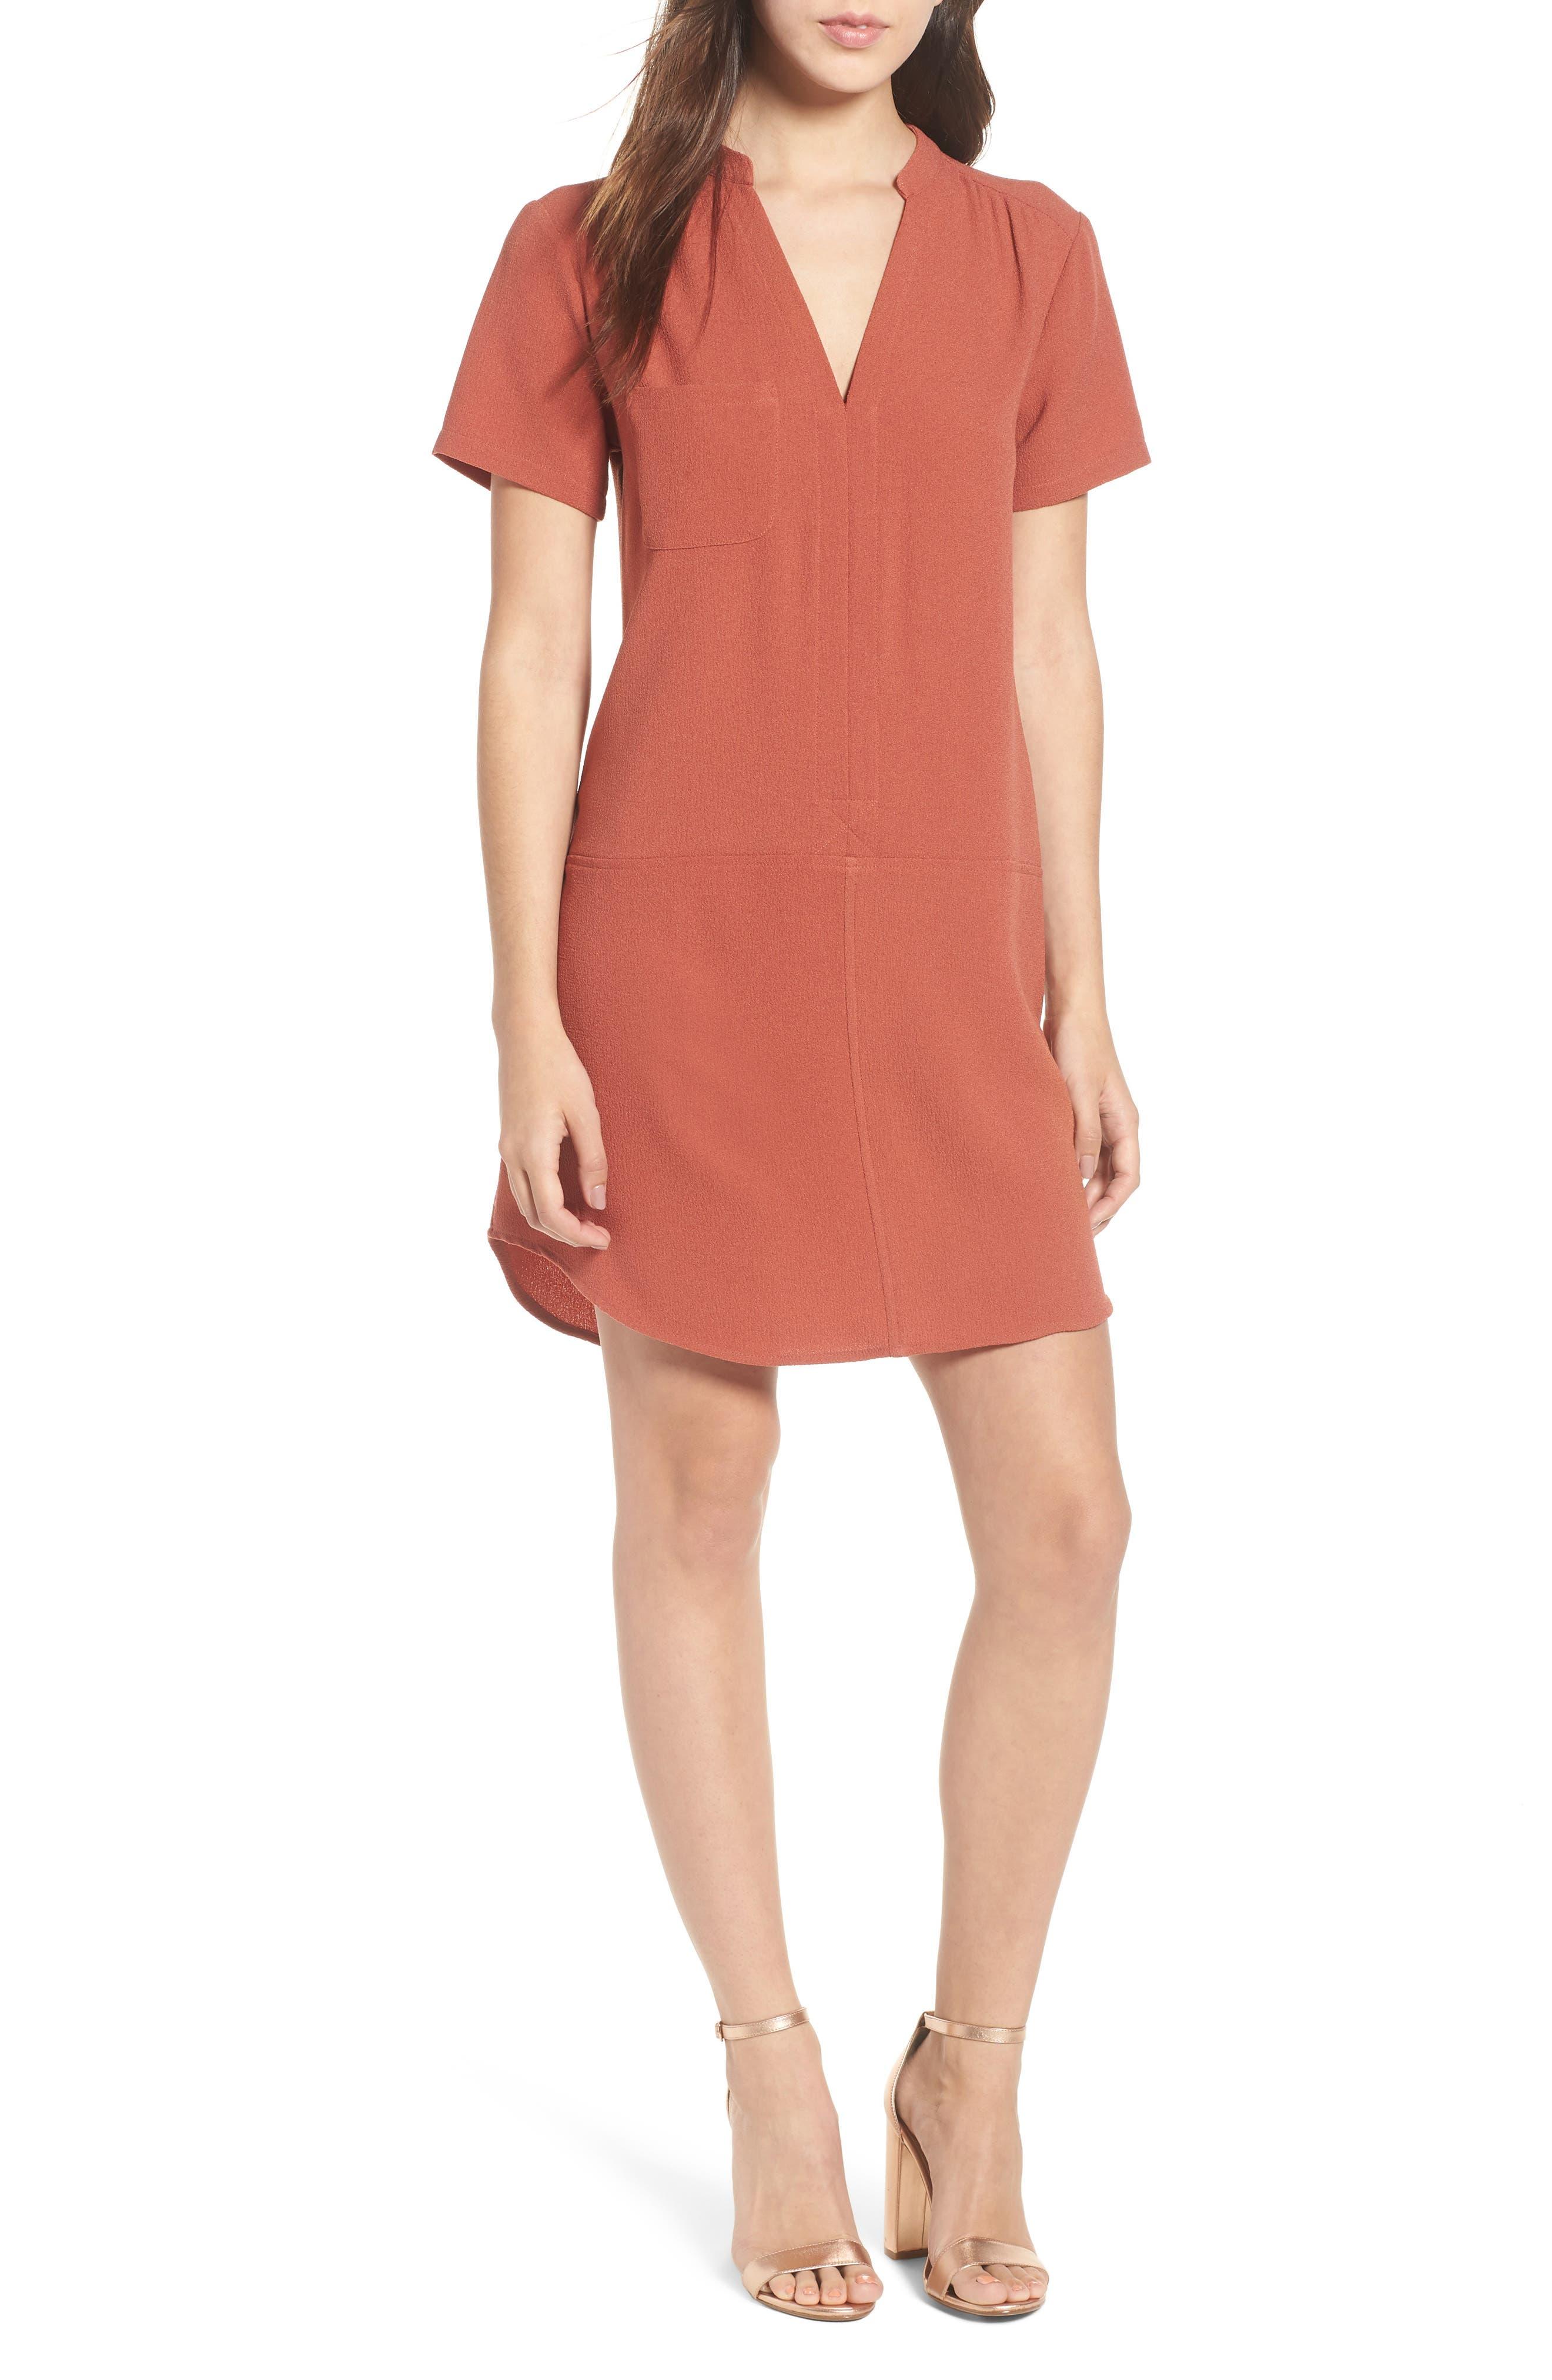 Womens Nicky Dress sleeveless Dress Blend ot9QOONOf